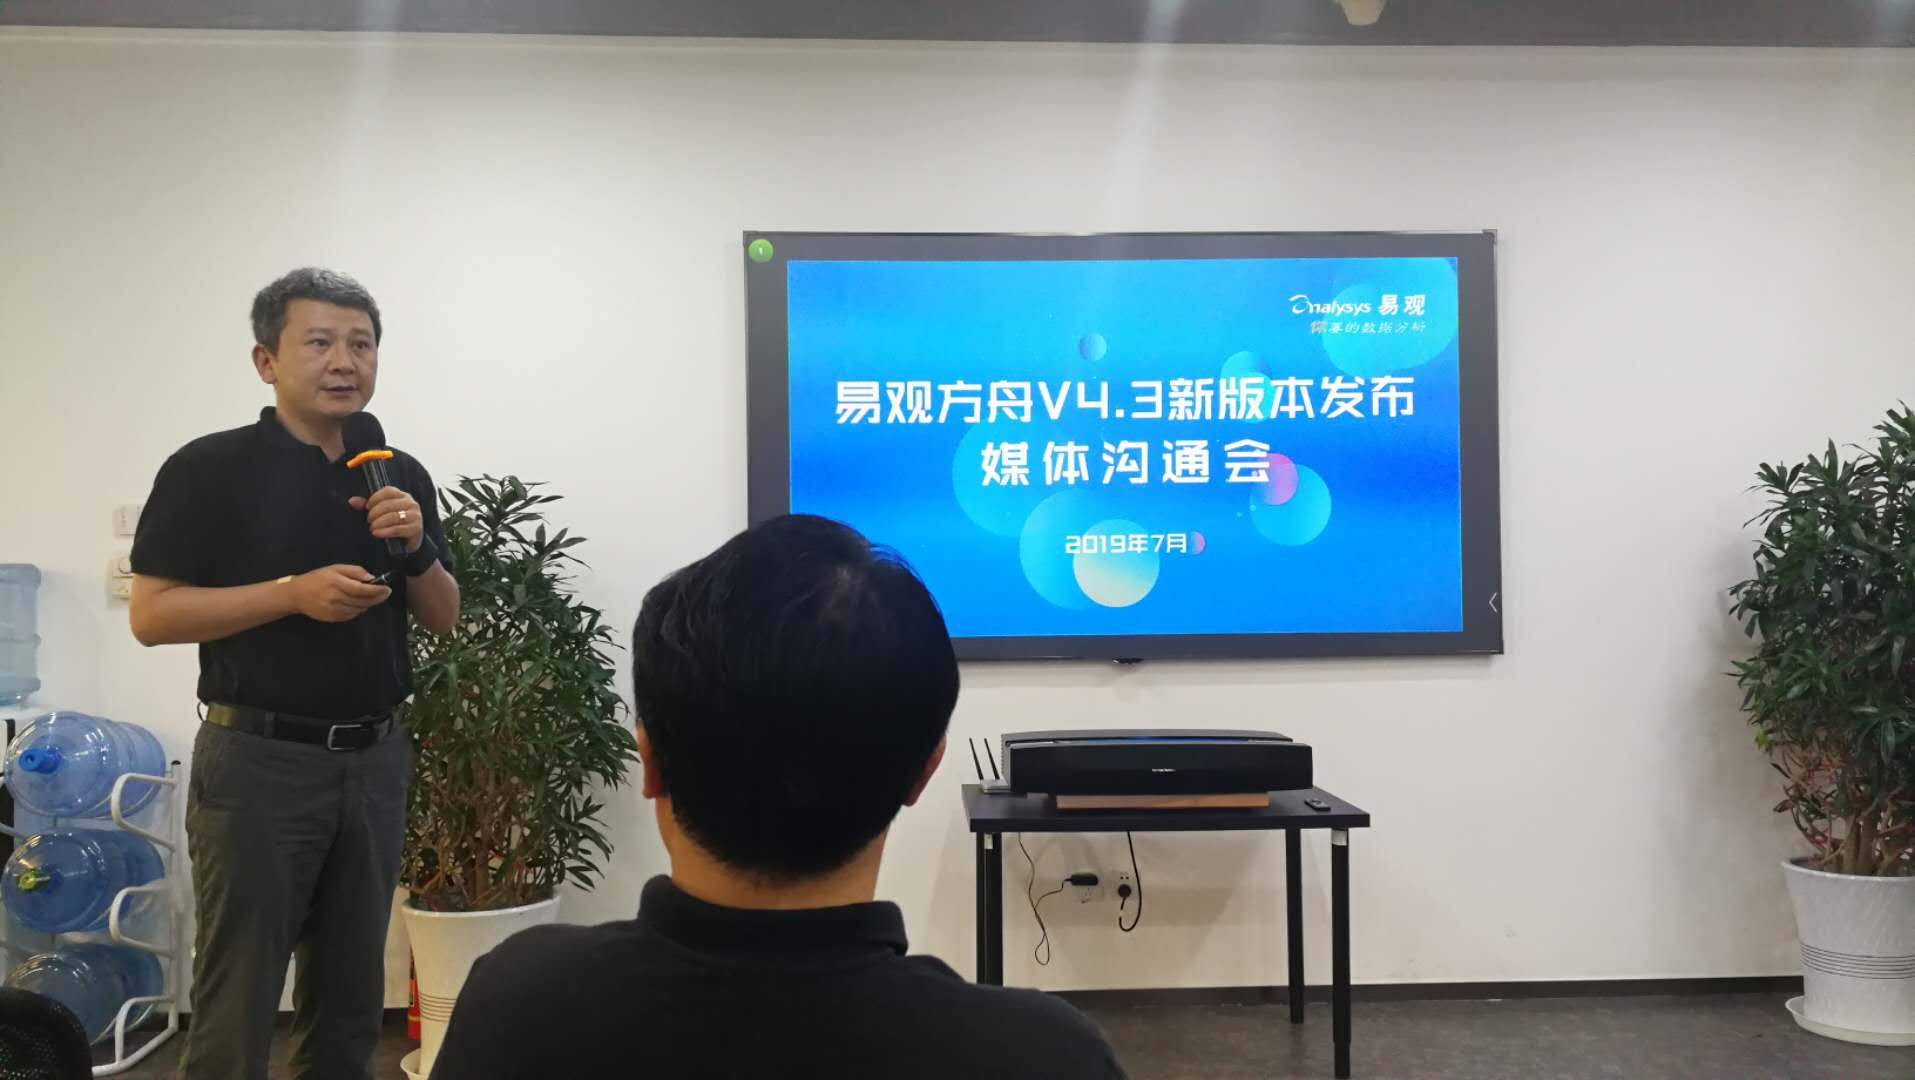 【ToB快讯】易观方舟V4.3版本发布,智能埋点解决数据运营难